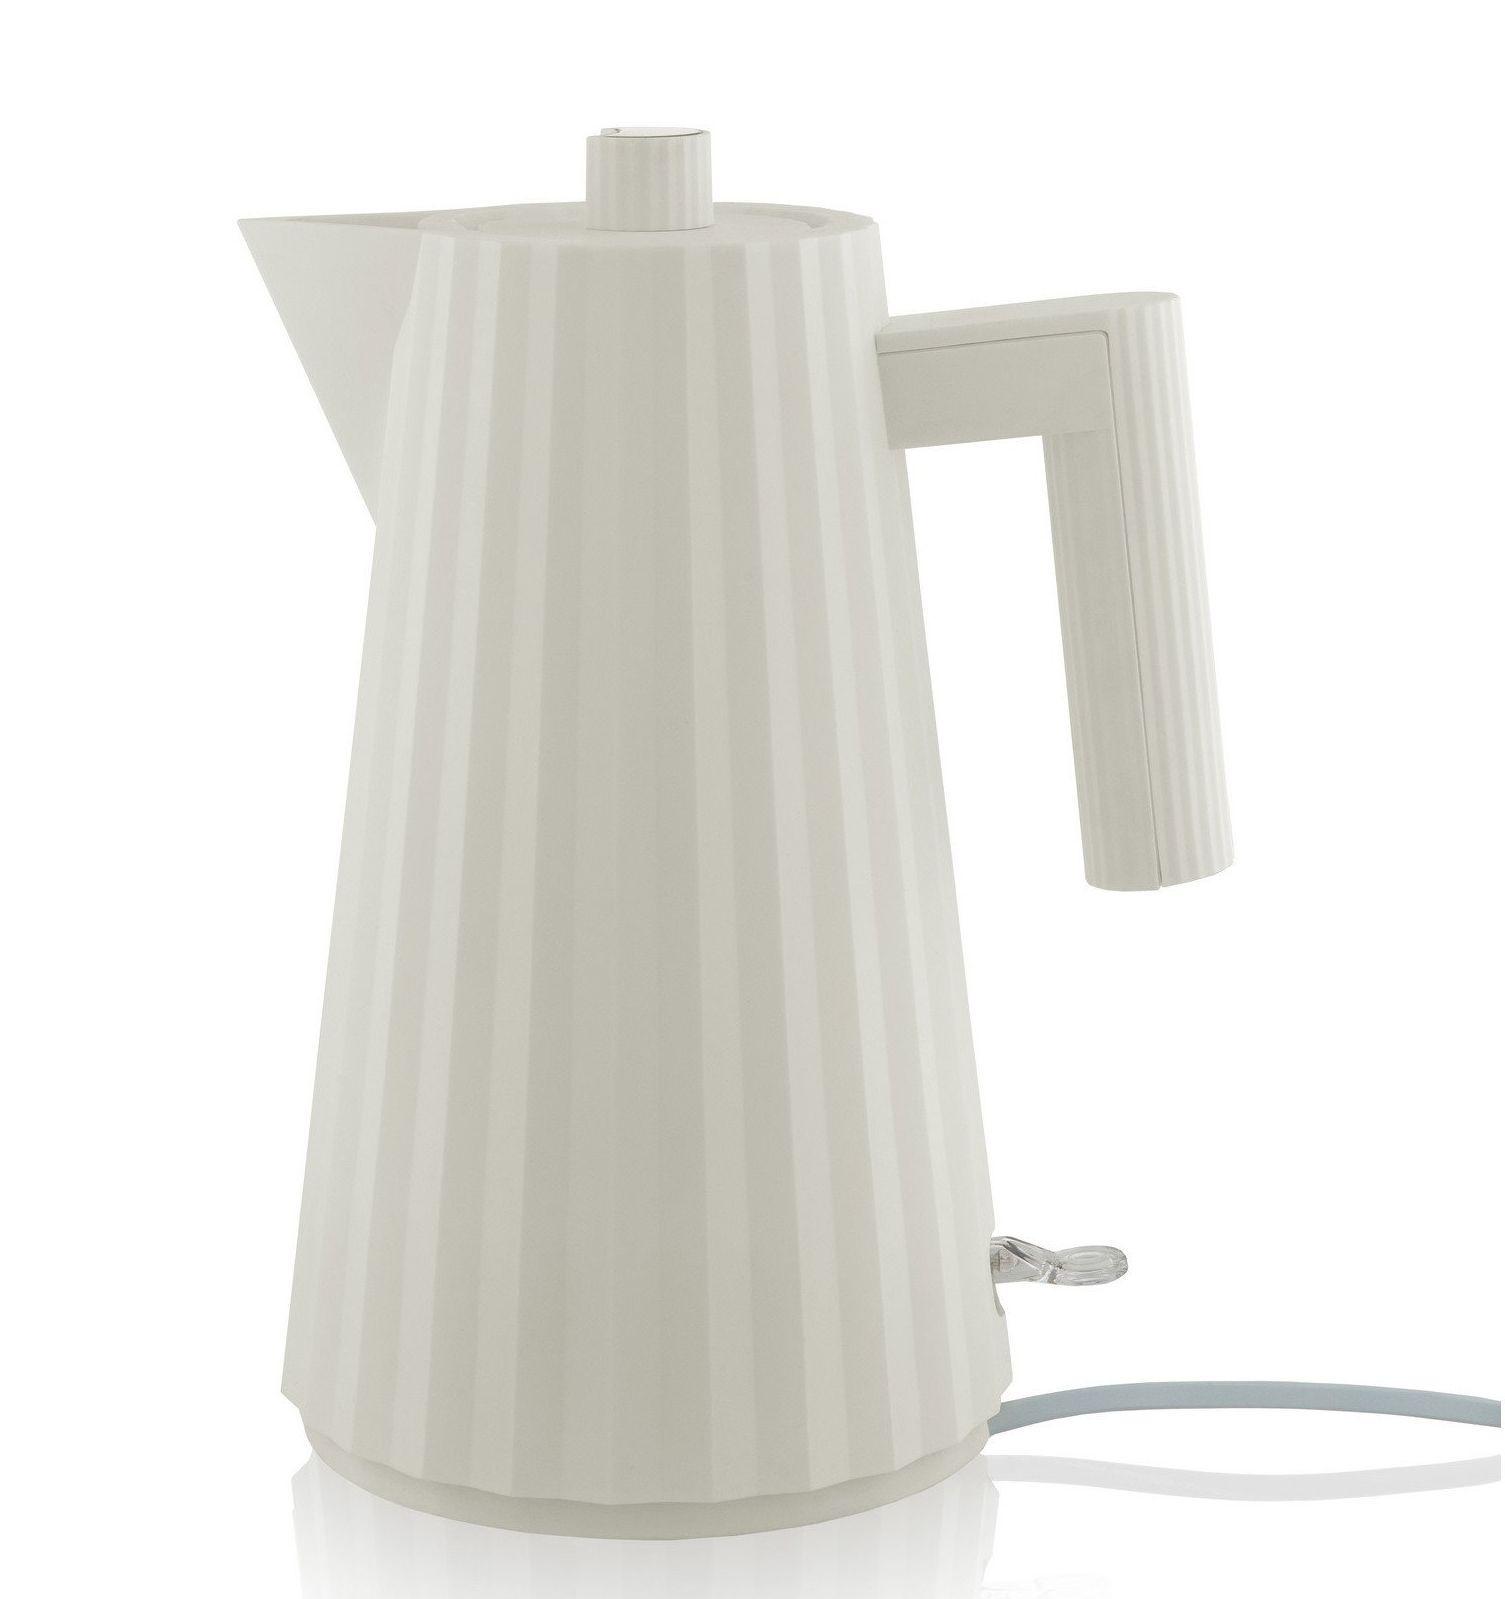 Alessi waterkoker Plissé wit - 1.7 liter